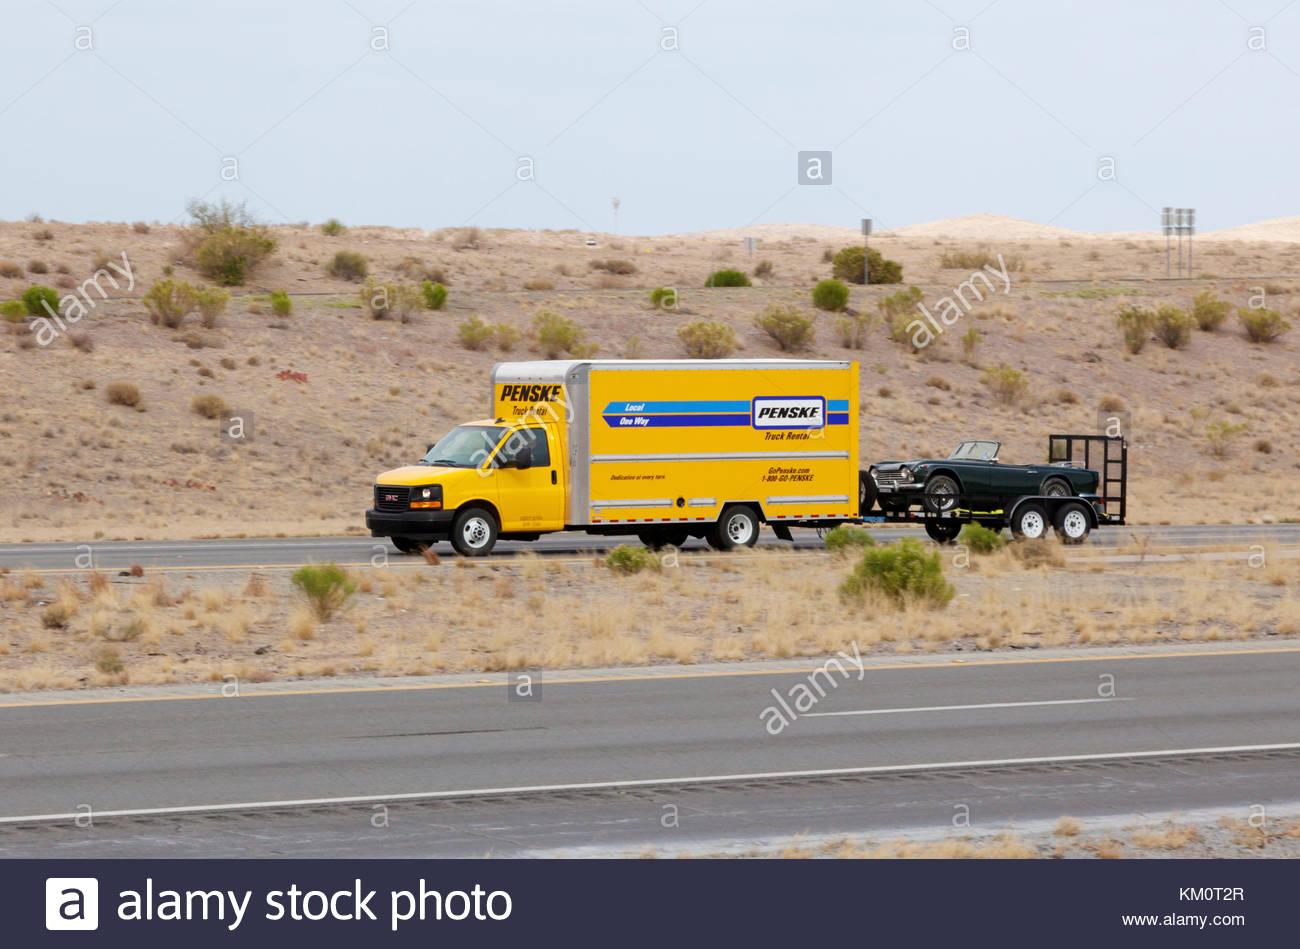 Penske Rental Truck Stock Photos Penske Rental Truck Stock Images